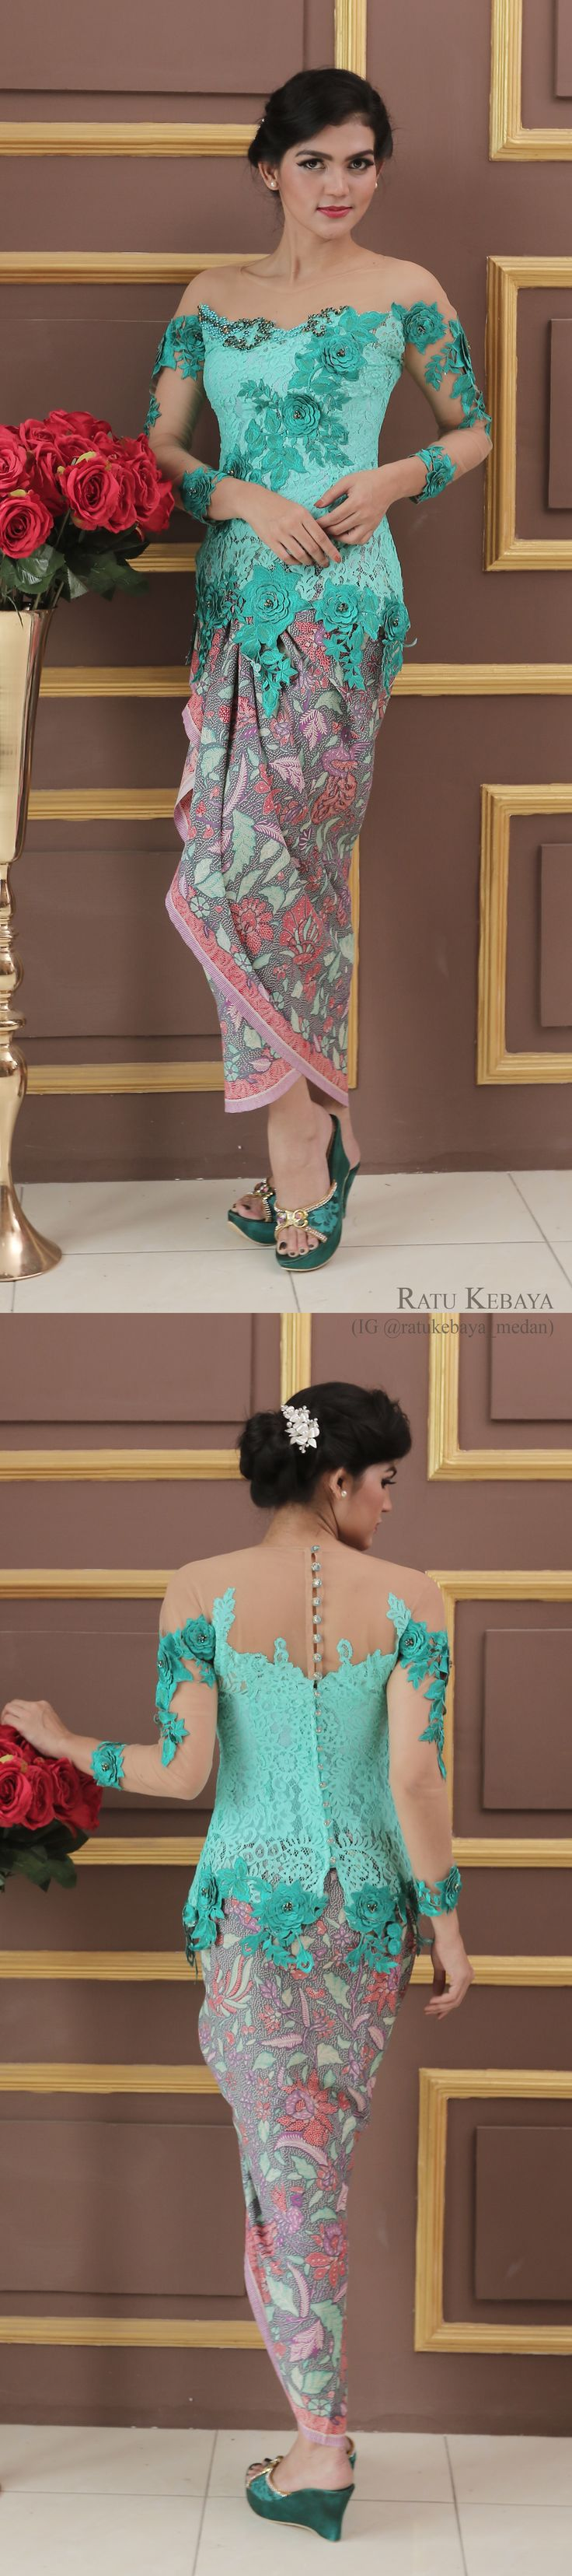 Kebaya hijau tosca dengan rok lilit batik senada (IG @ratukebaya_medan)